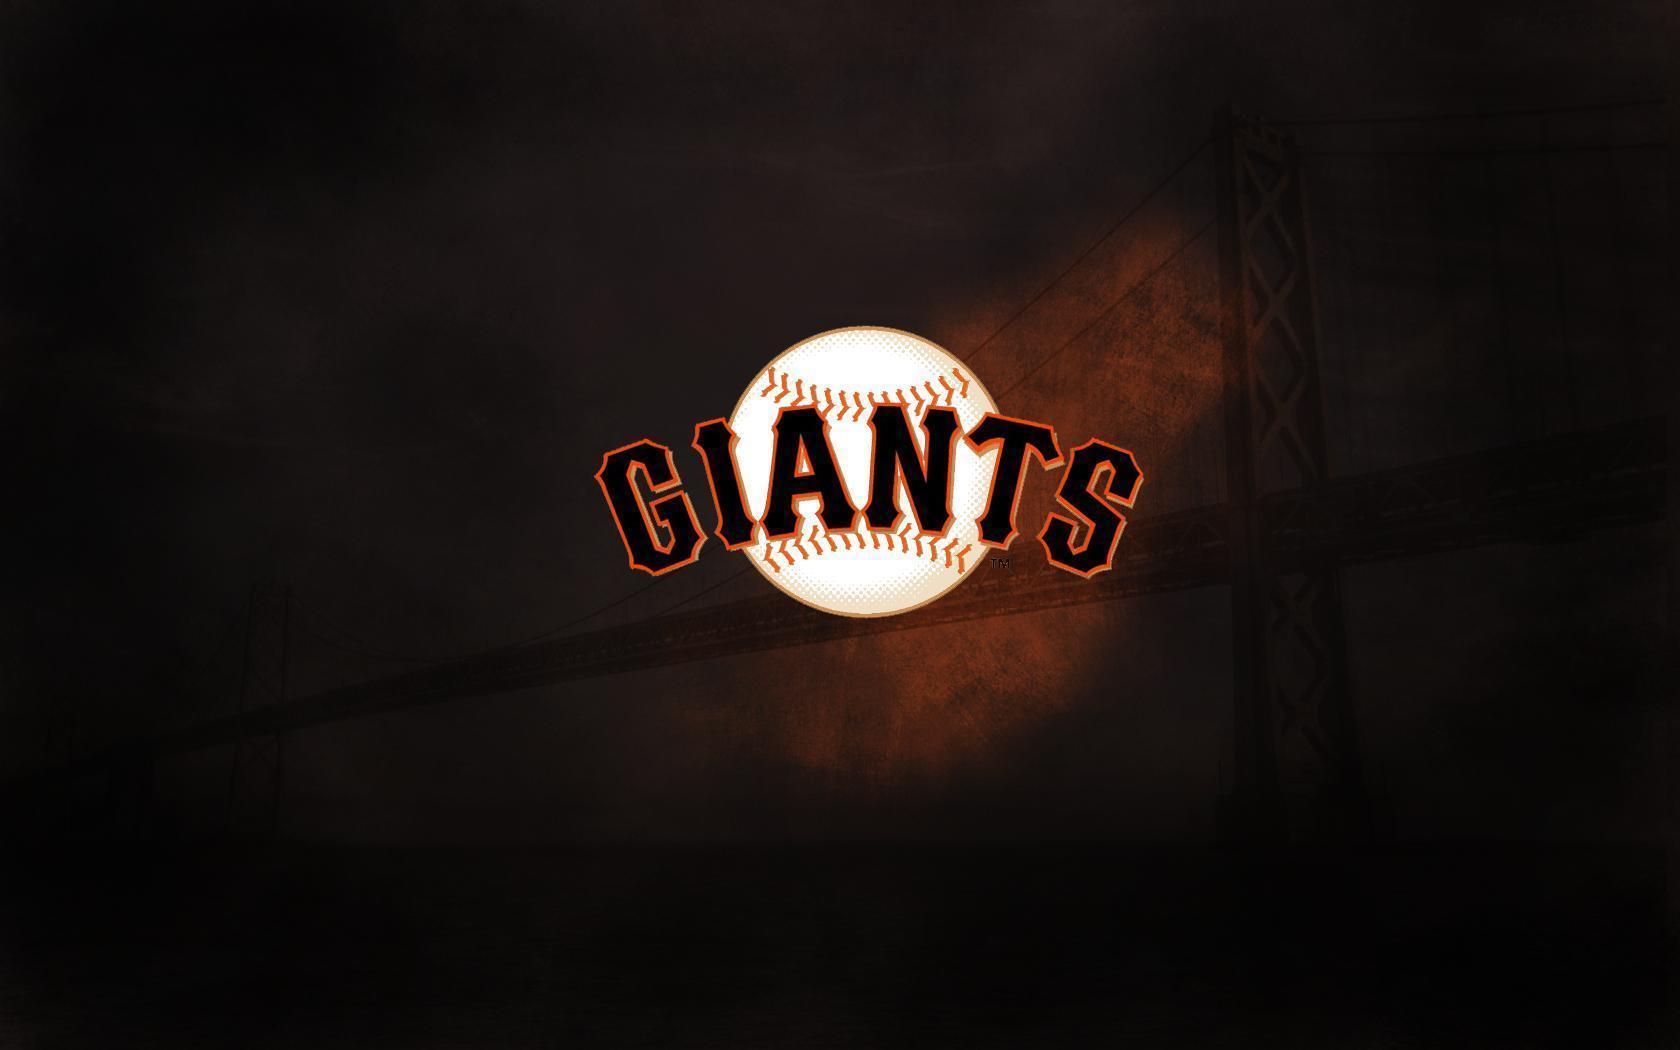 San Francisco Giants Wallpapers 1680x1050